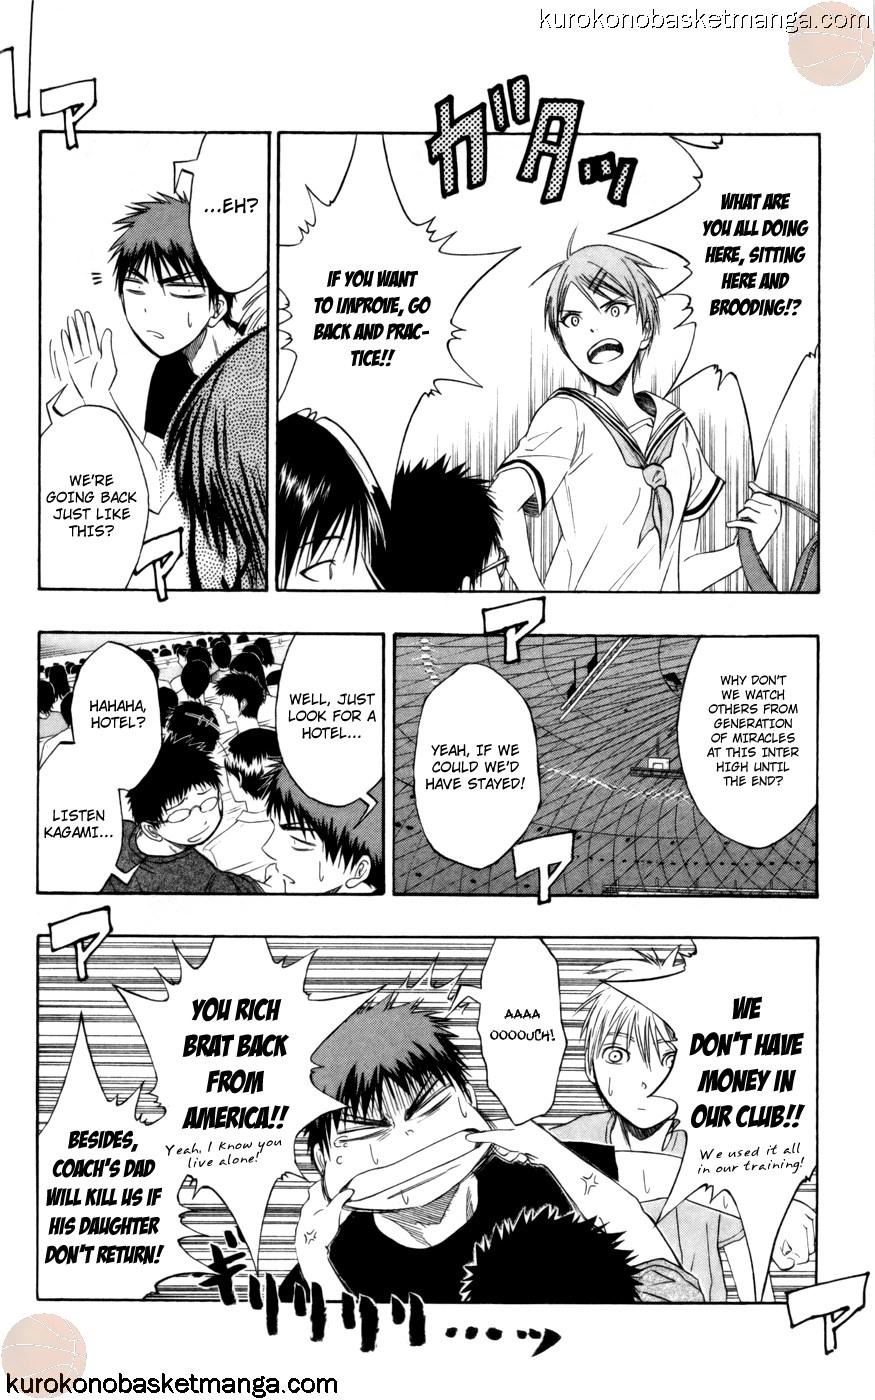 Kuroko no Basket Manga Chapter 73 - Image 16